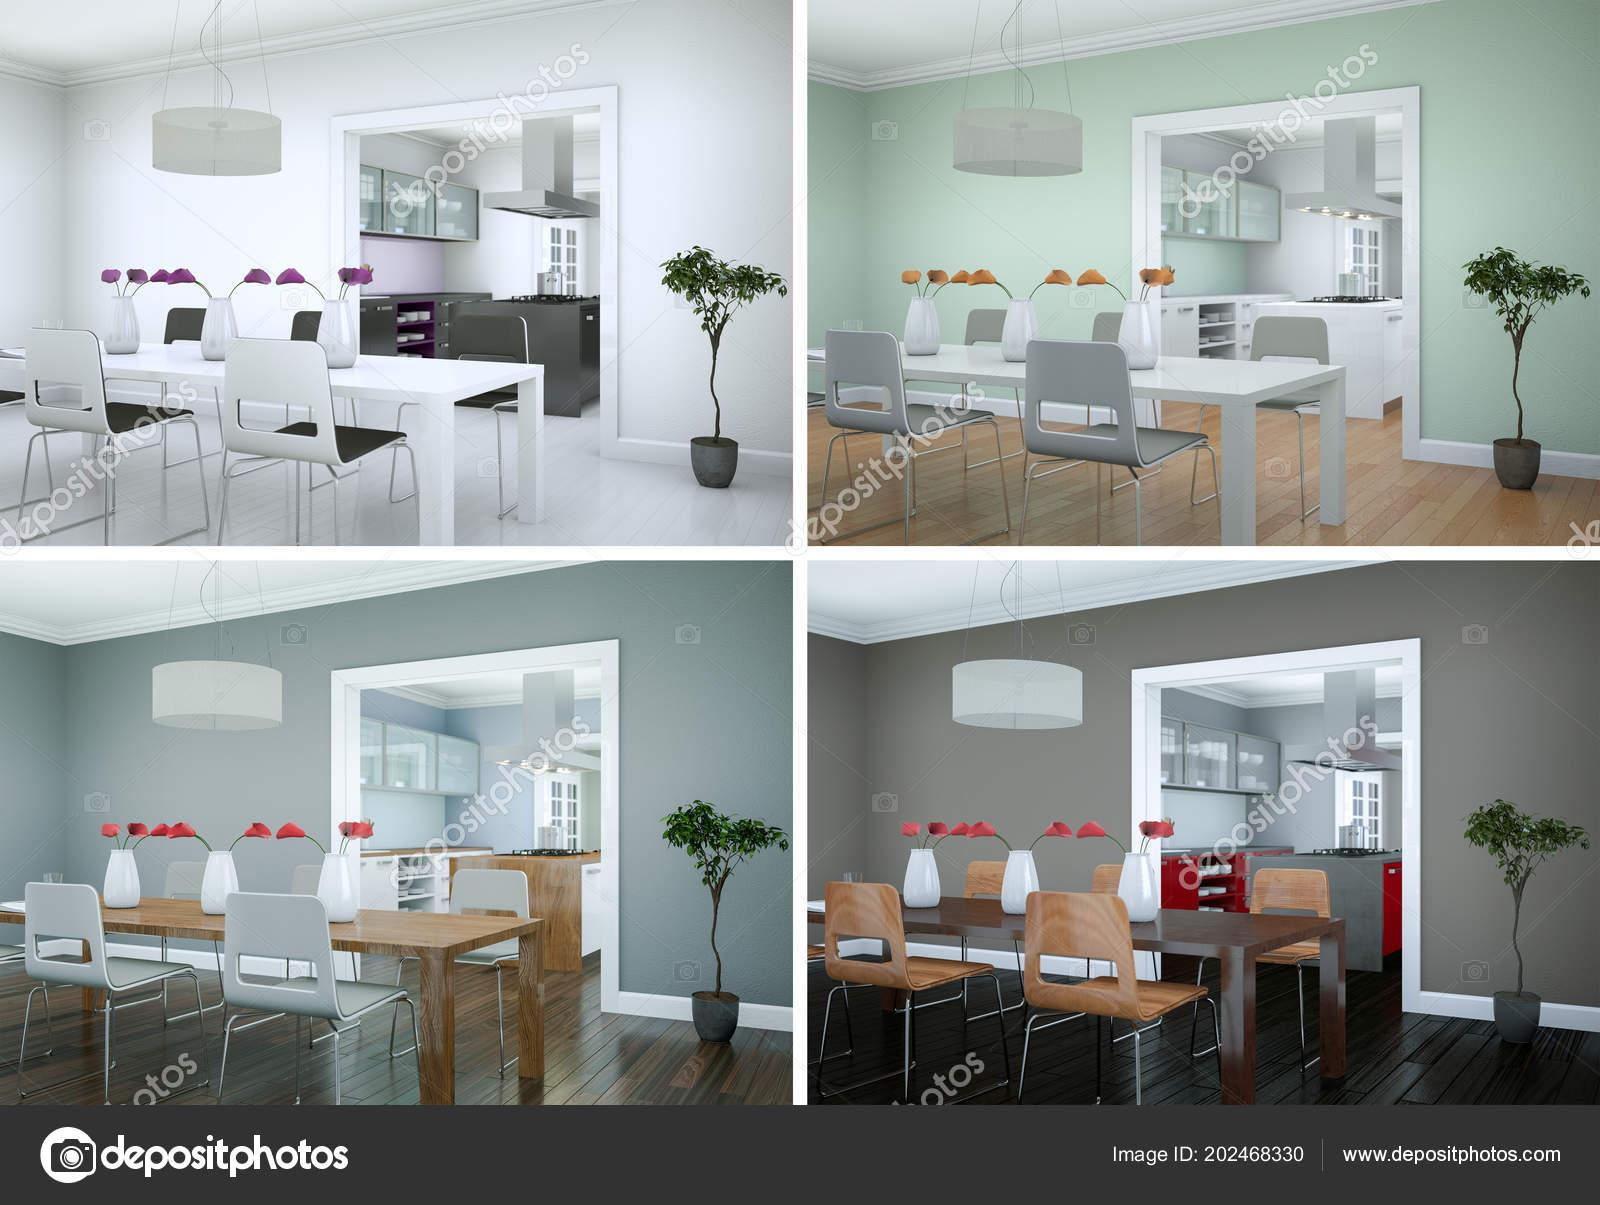 Modern interieur woonkamer kleuren eenvoudig zwart wit interieur